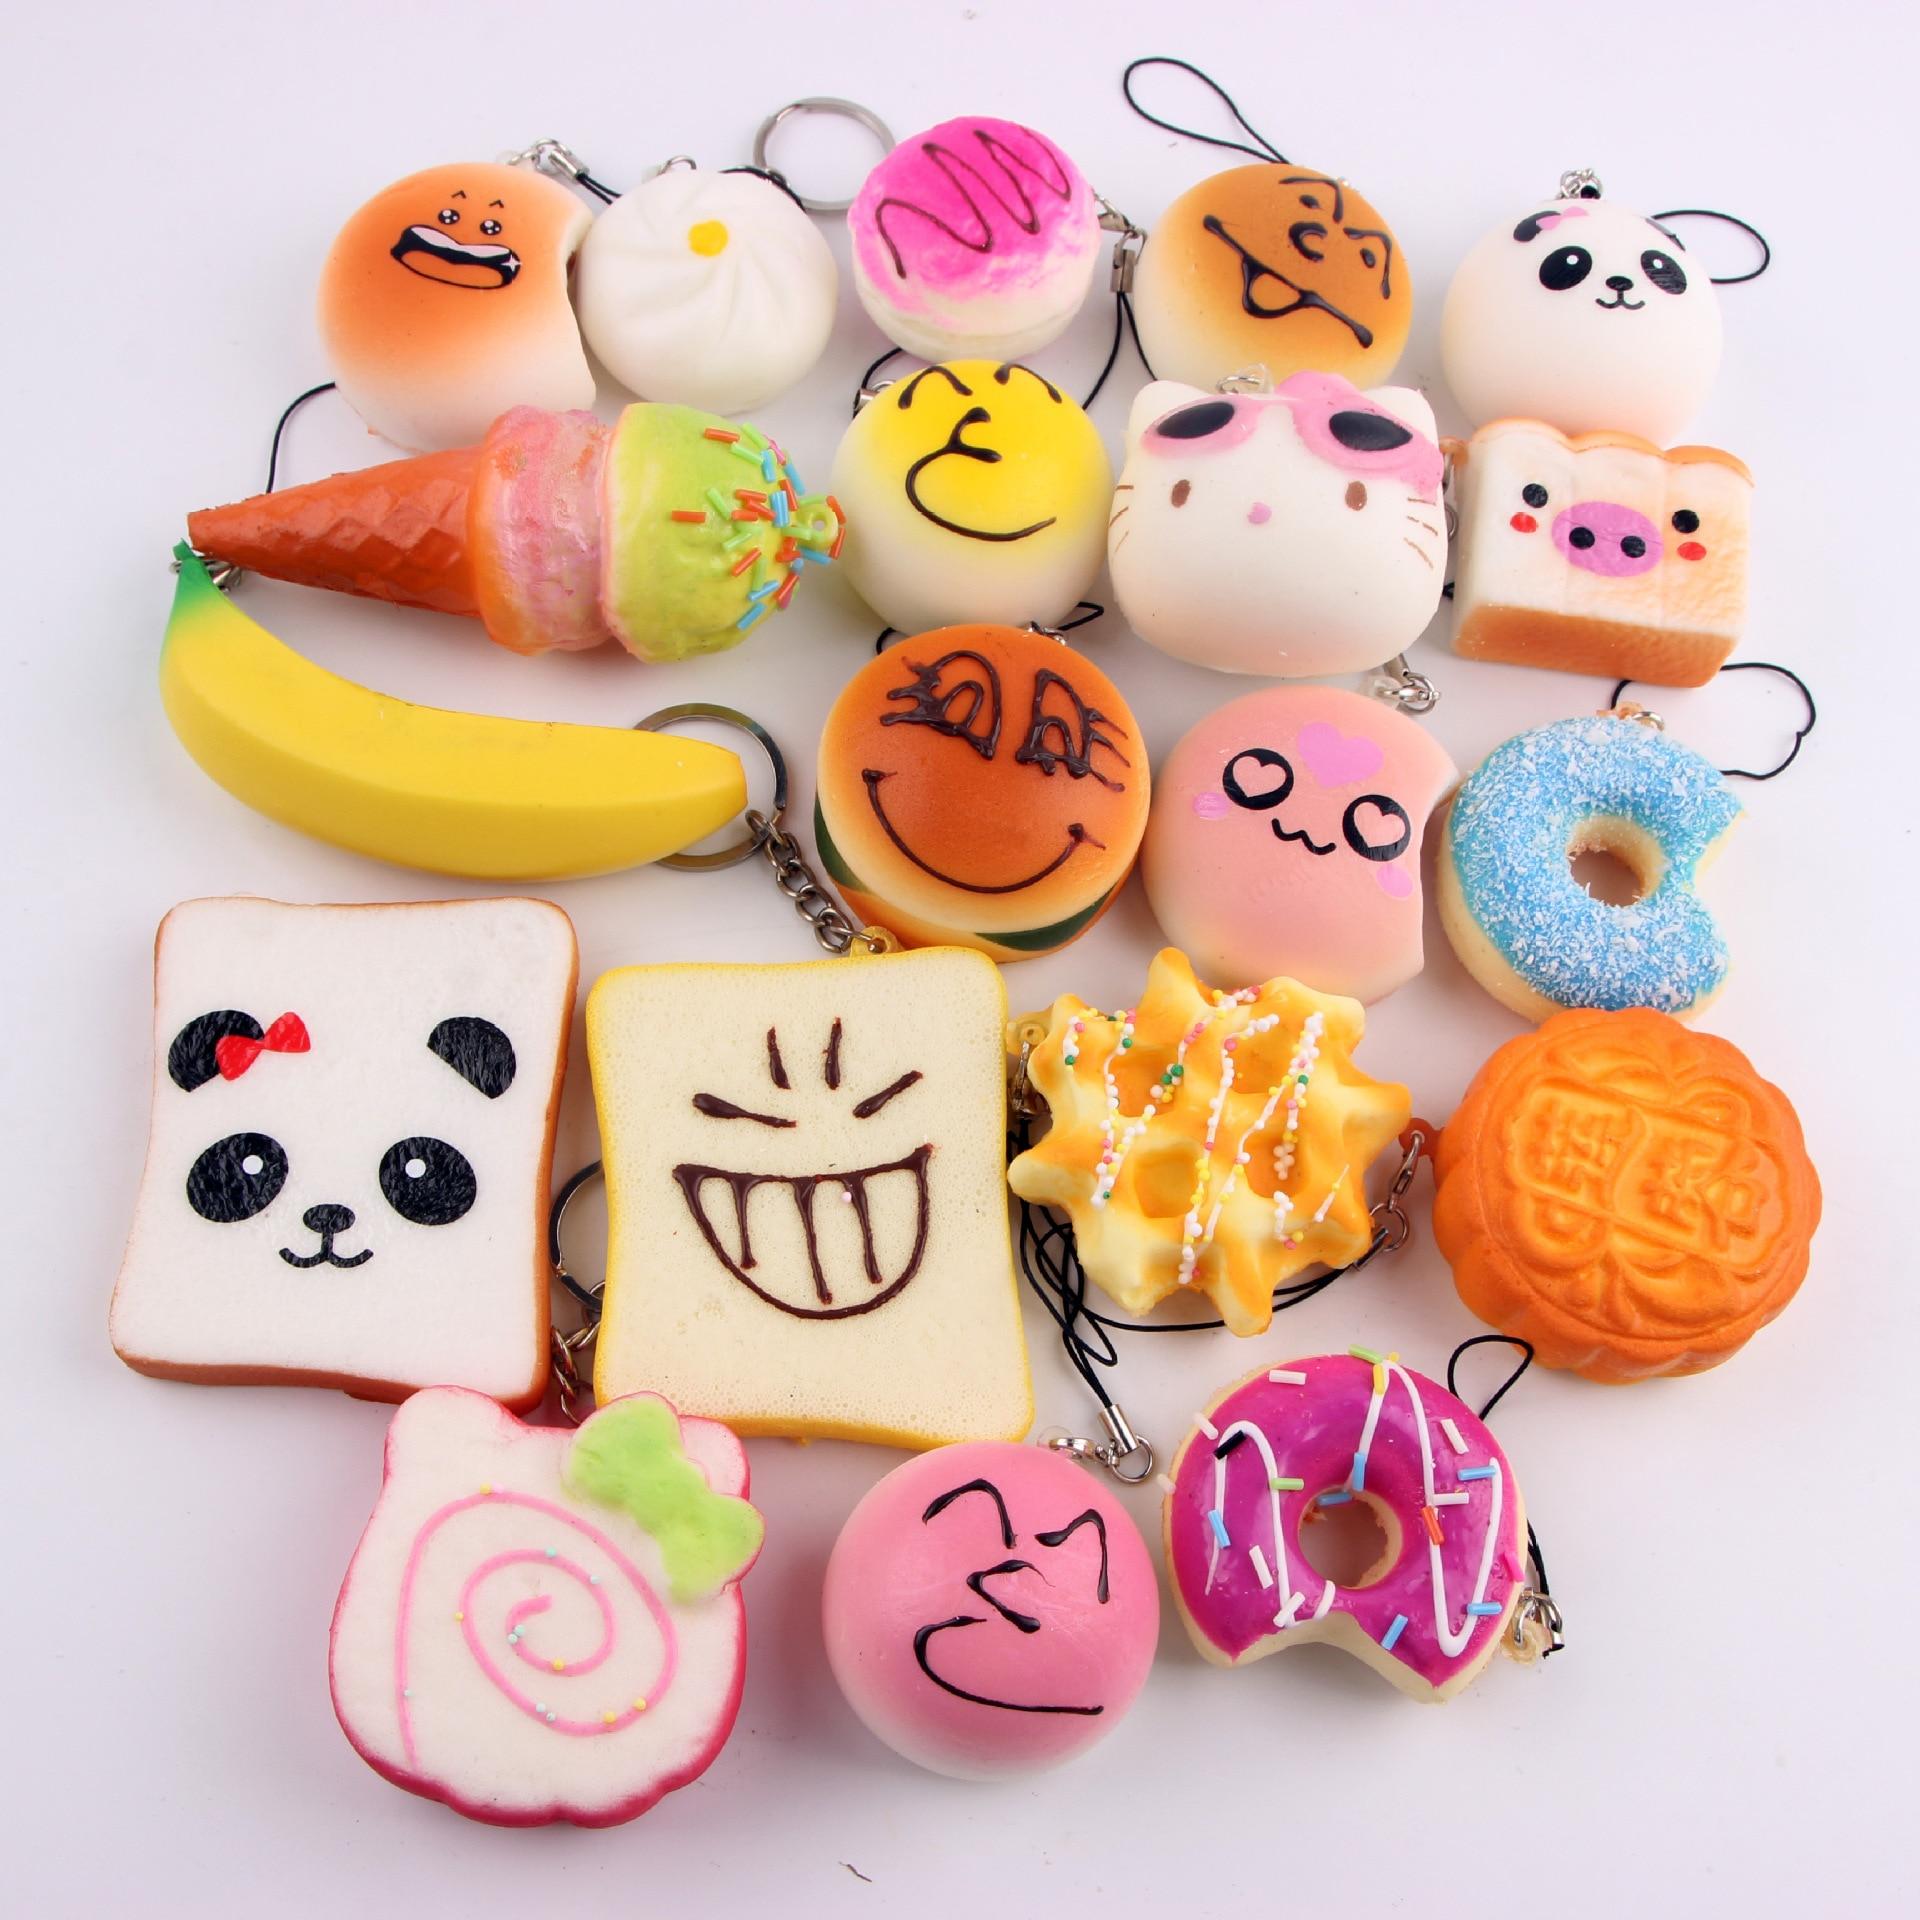 Buy 10pcs hot sale kawaii donuts squishy for Squishy ideas